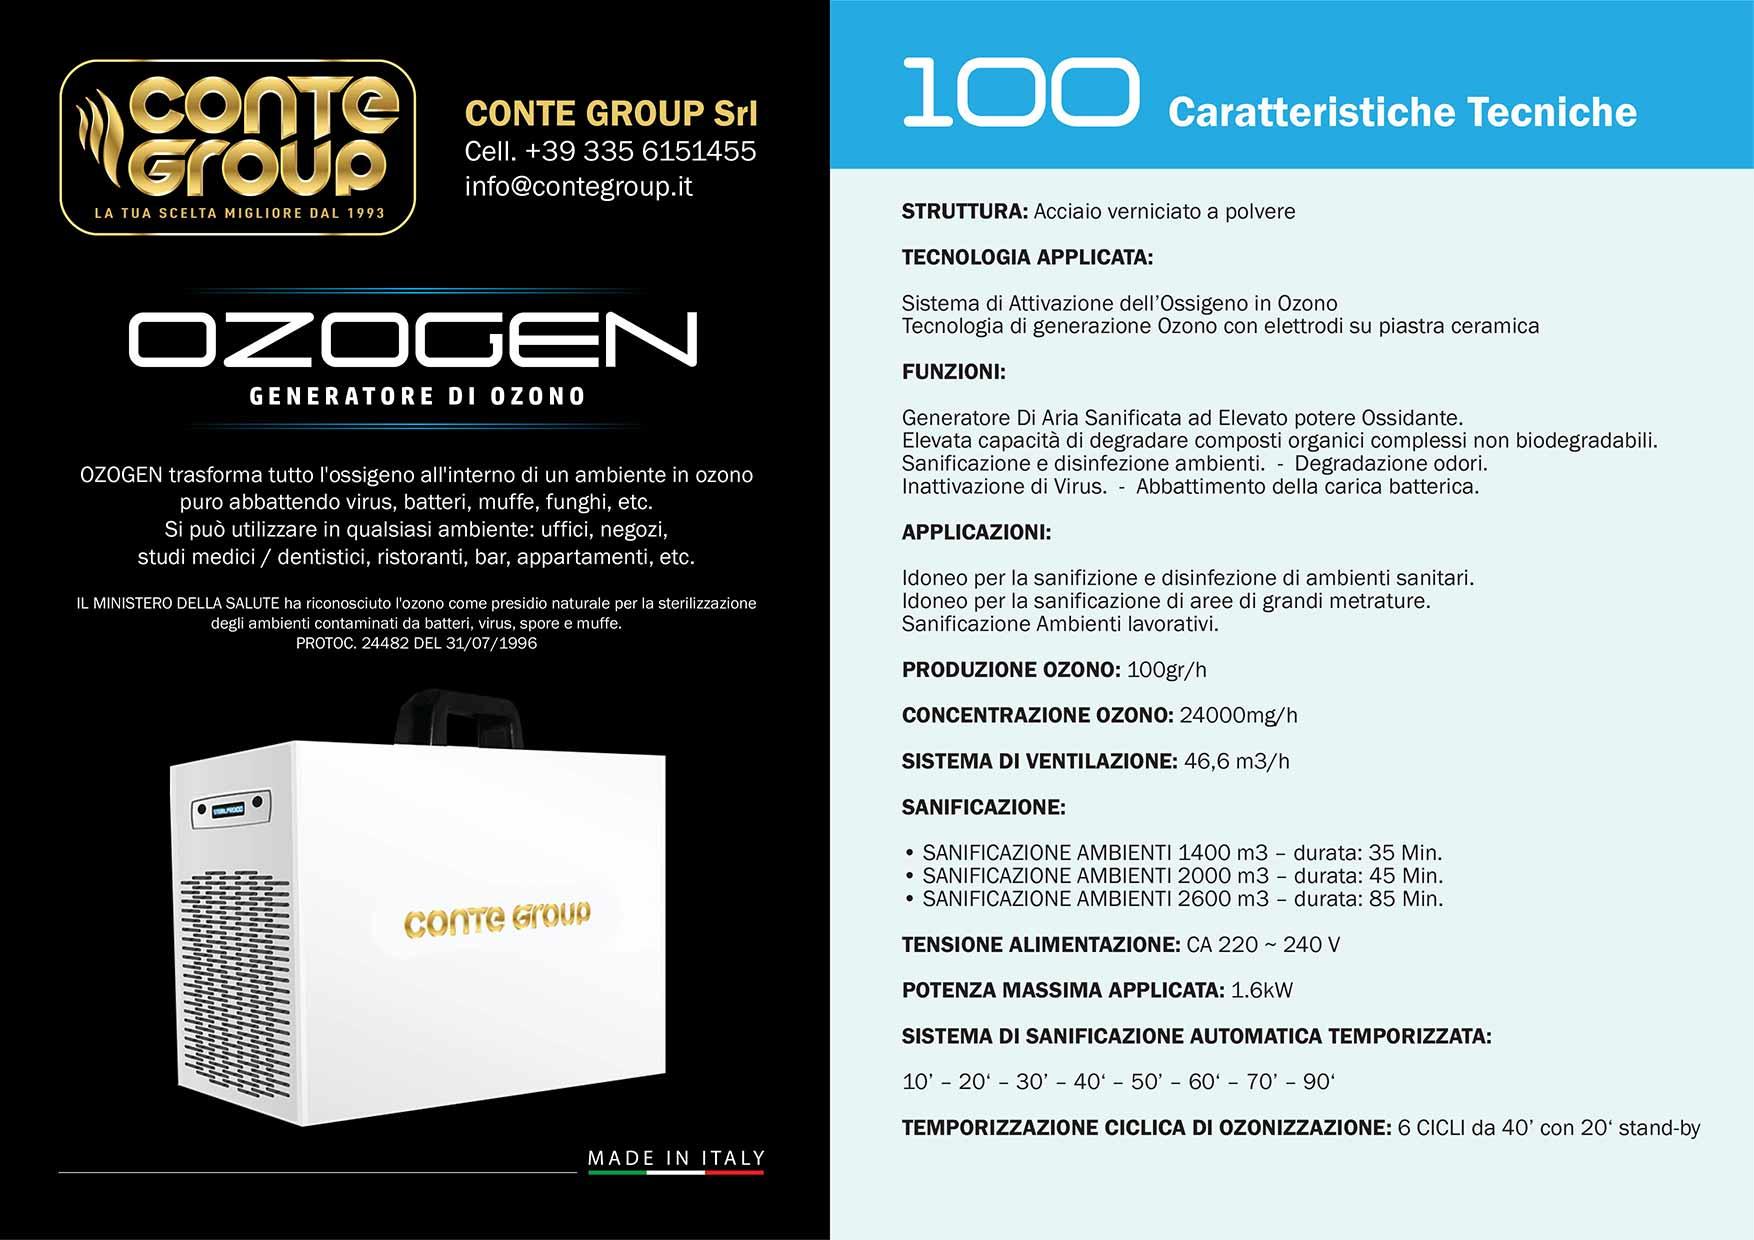 Ozogen-100